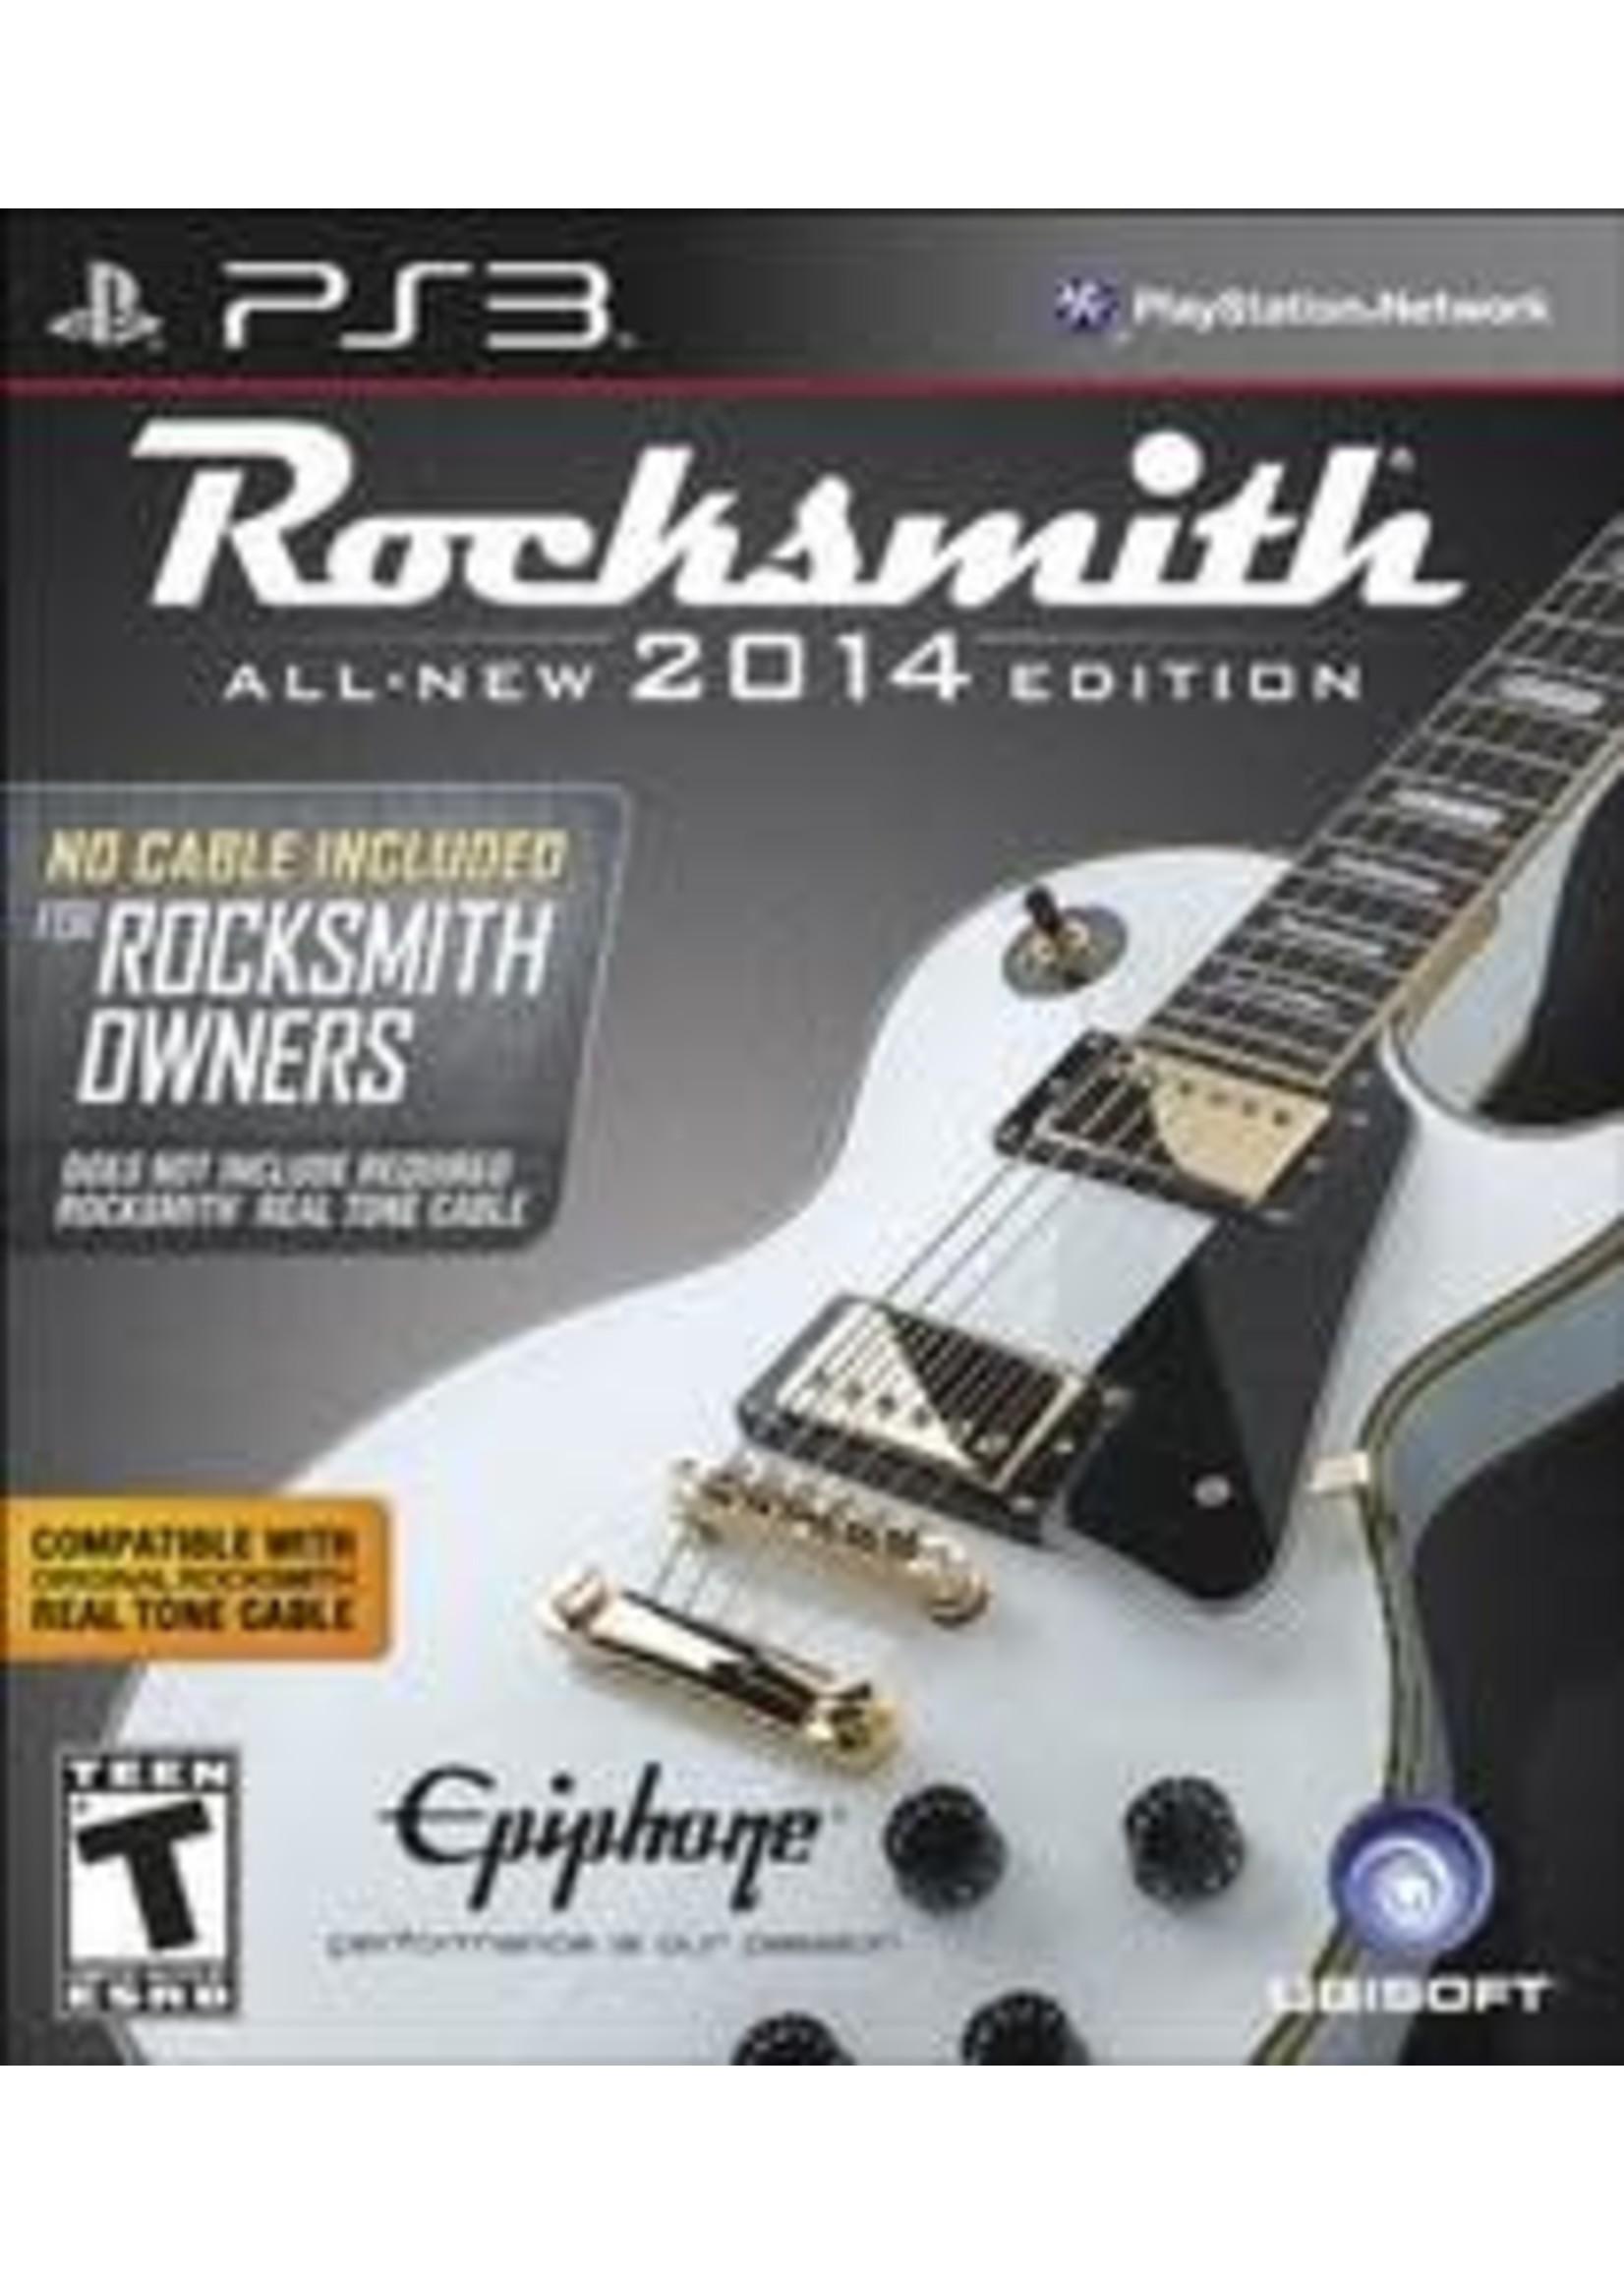 Rocksmith 2014 [No Cable] Playstation 3